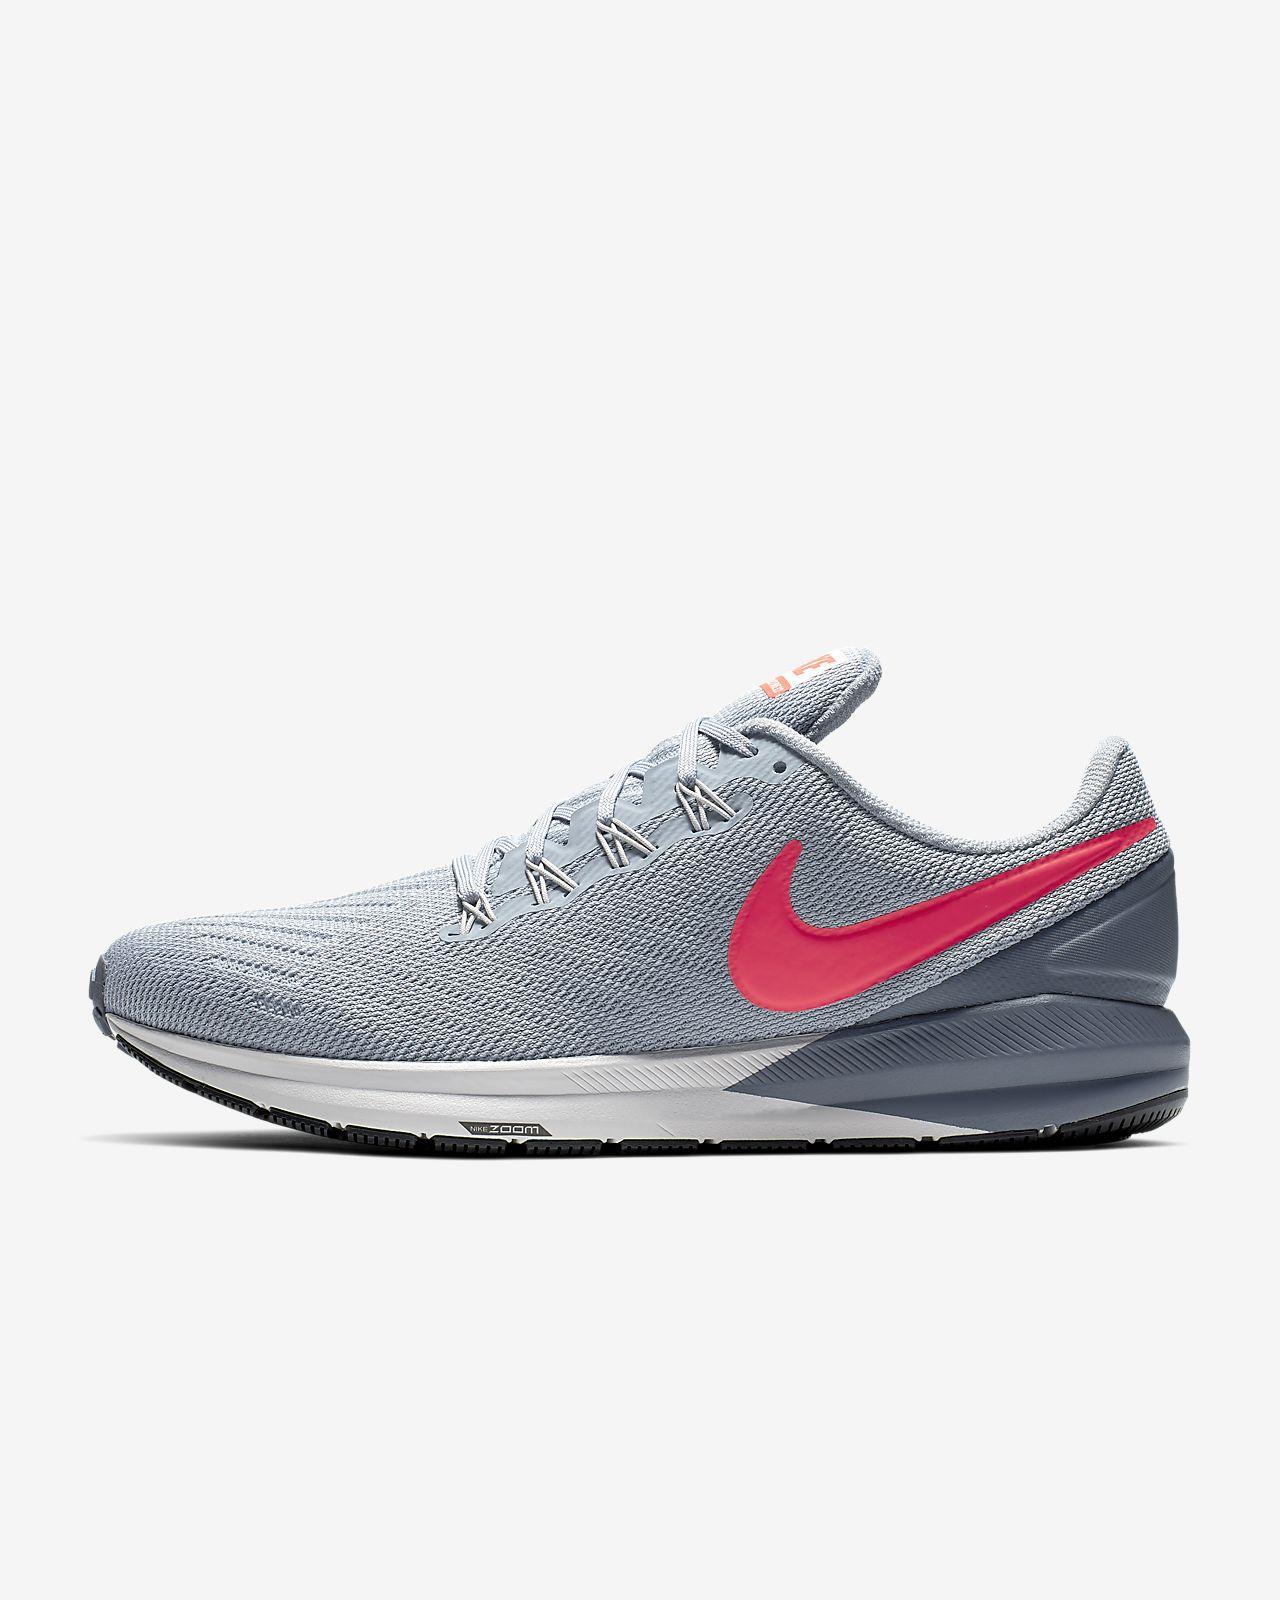 Nike Air Zoom Structure 22 Zapatillas de running - Hombre